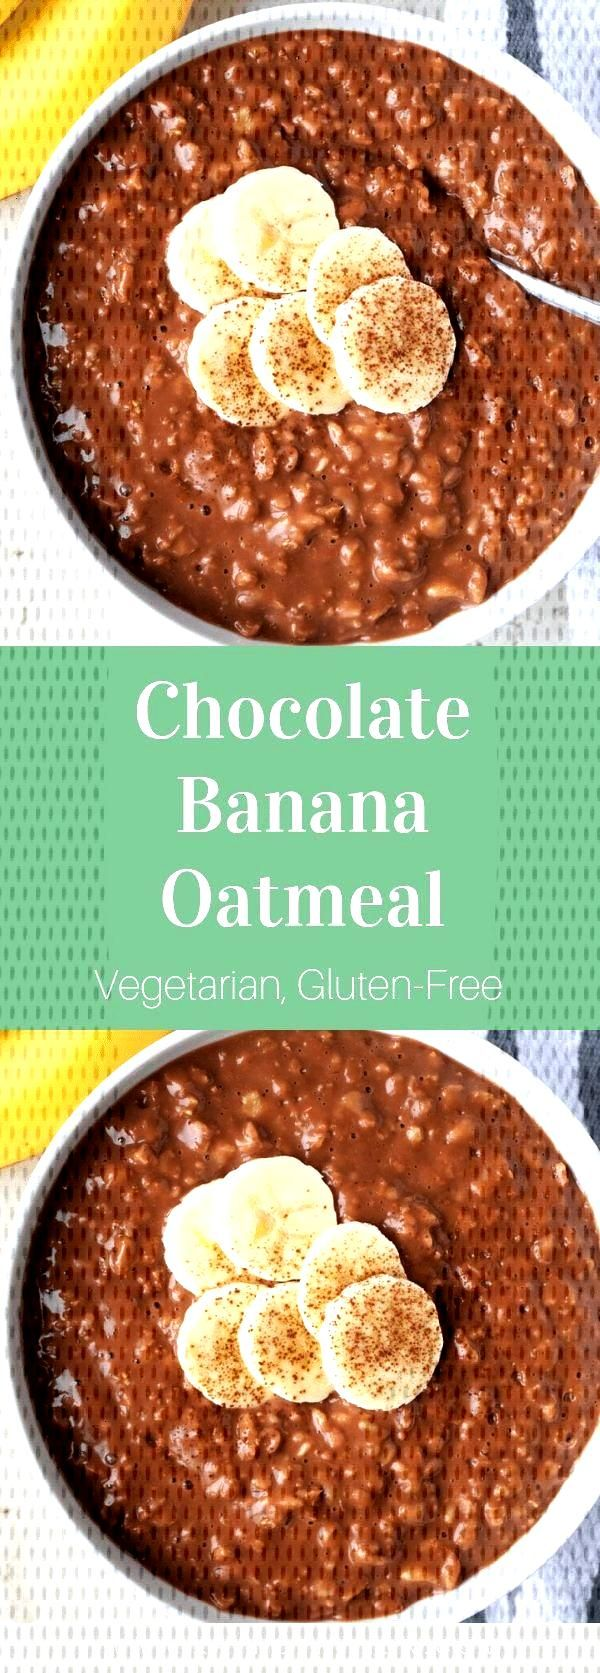 Chocolate Banana Oatmeal - Chocolate Banana Oatmeal – Stephanie Kay   Nutritionist amp Speaker -